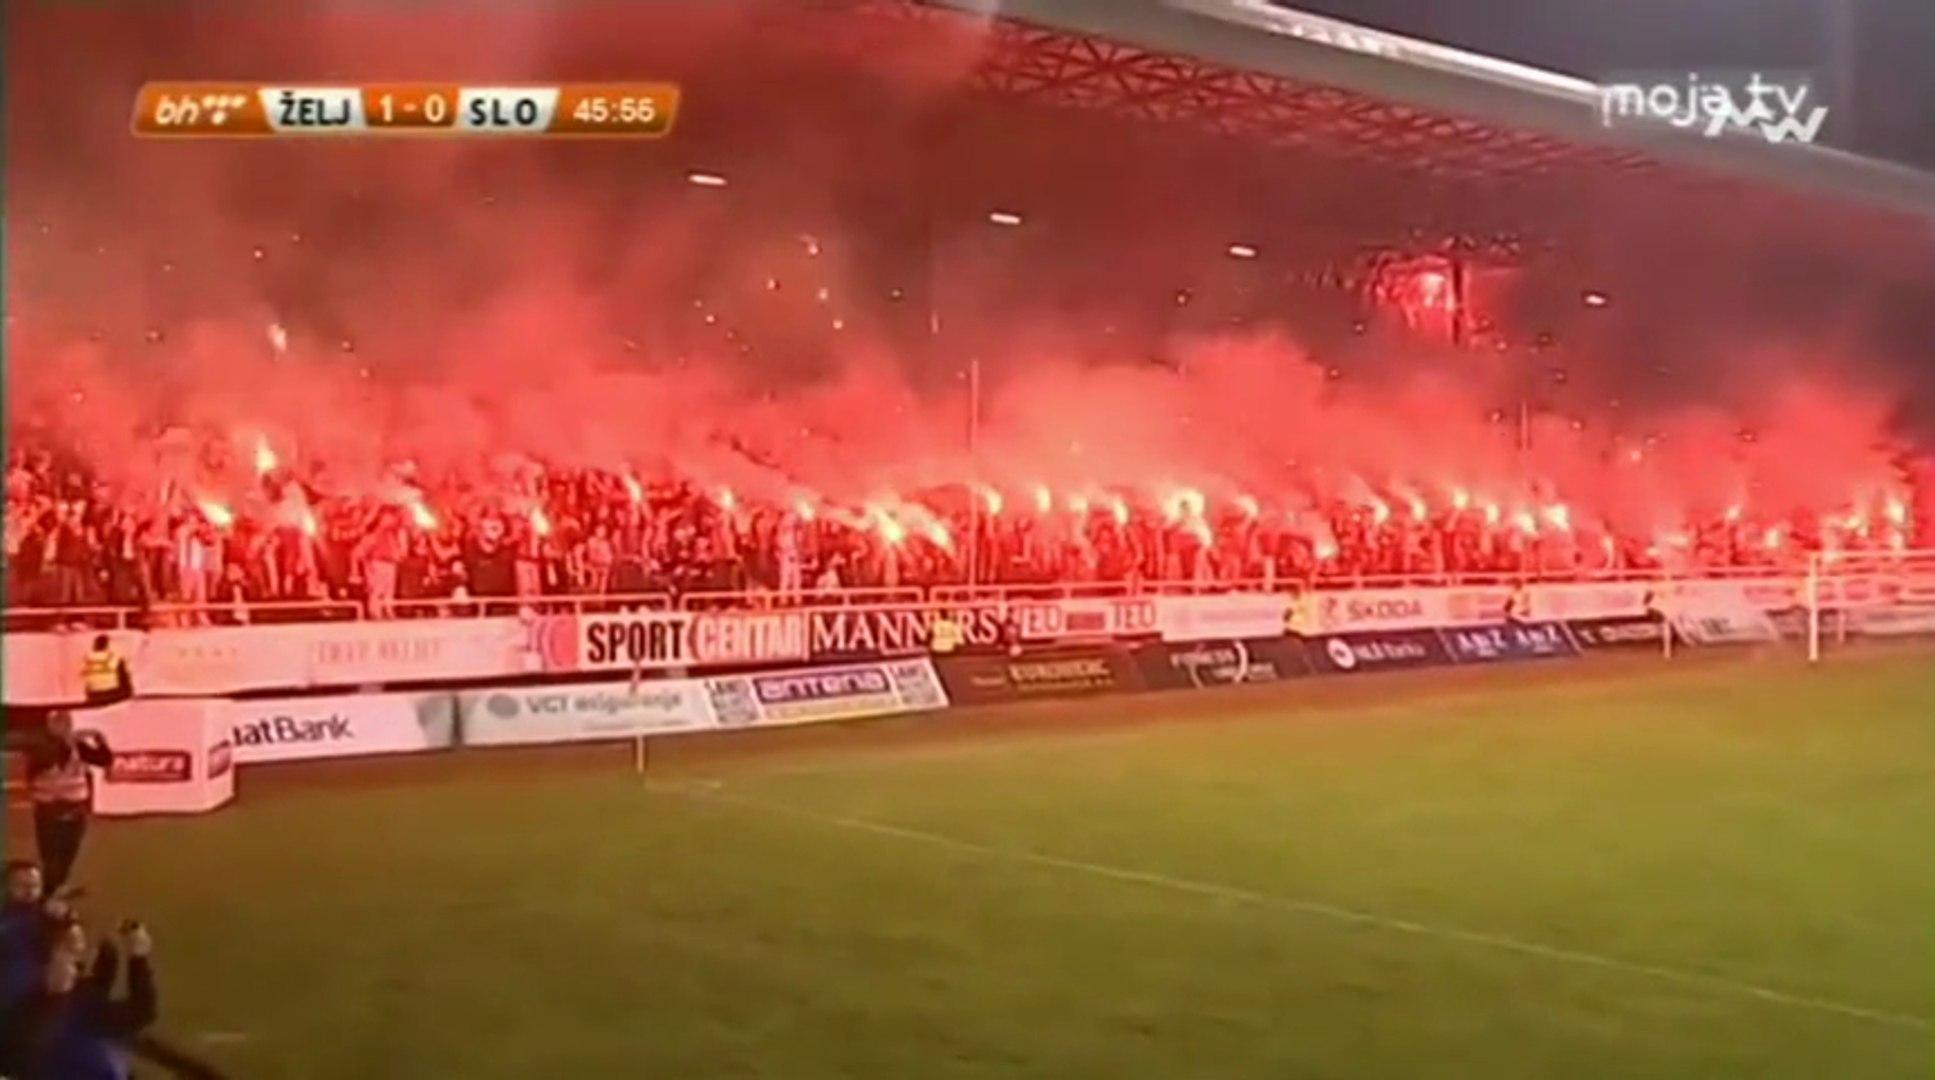 FK Željezničar - FK Sloboda / Vatromet i bakljada na Grbavici